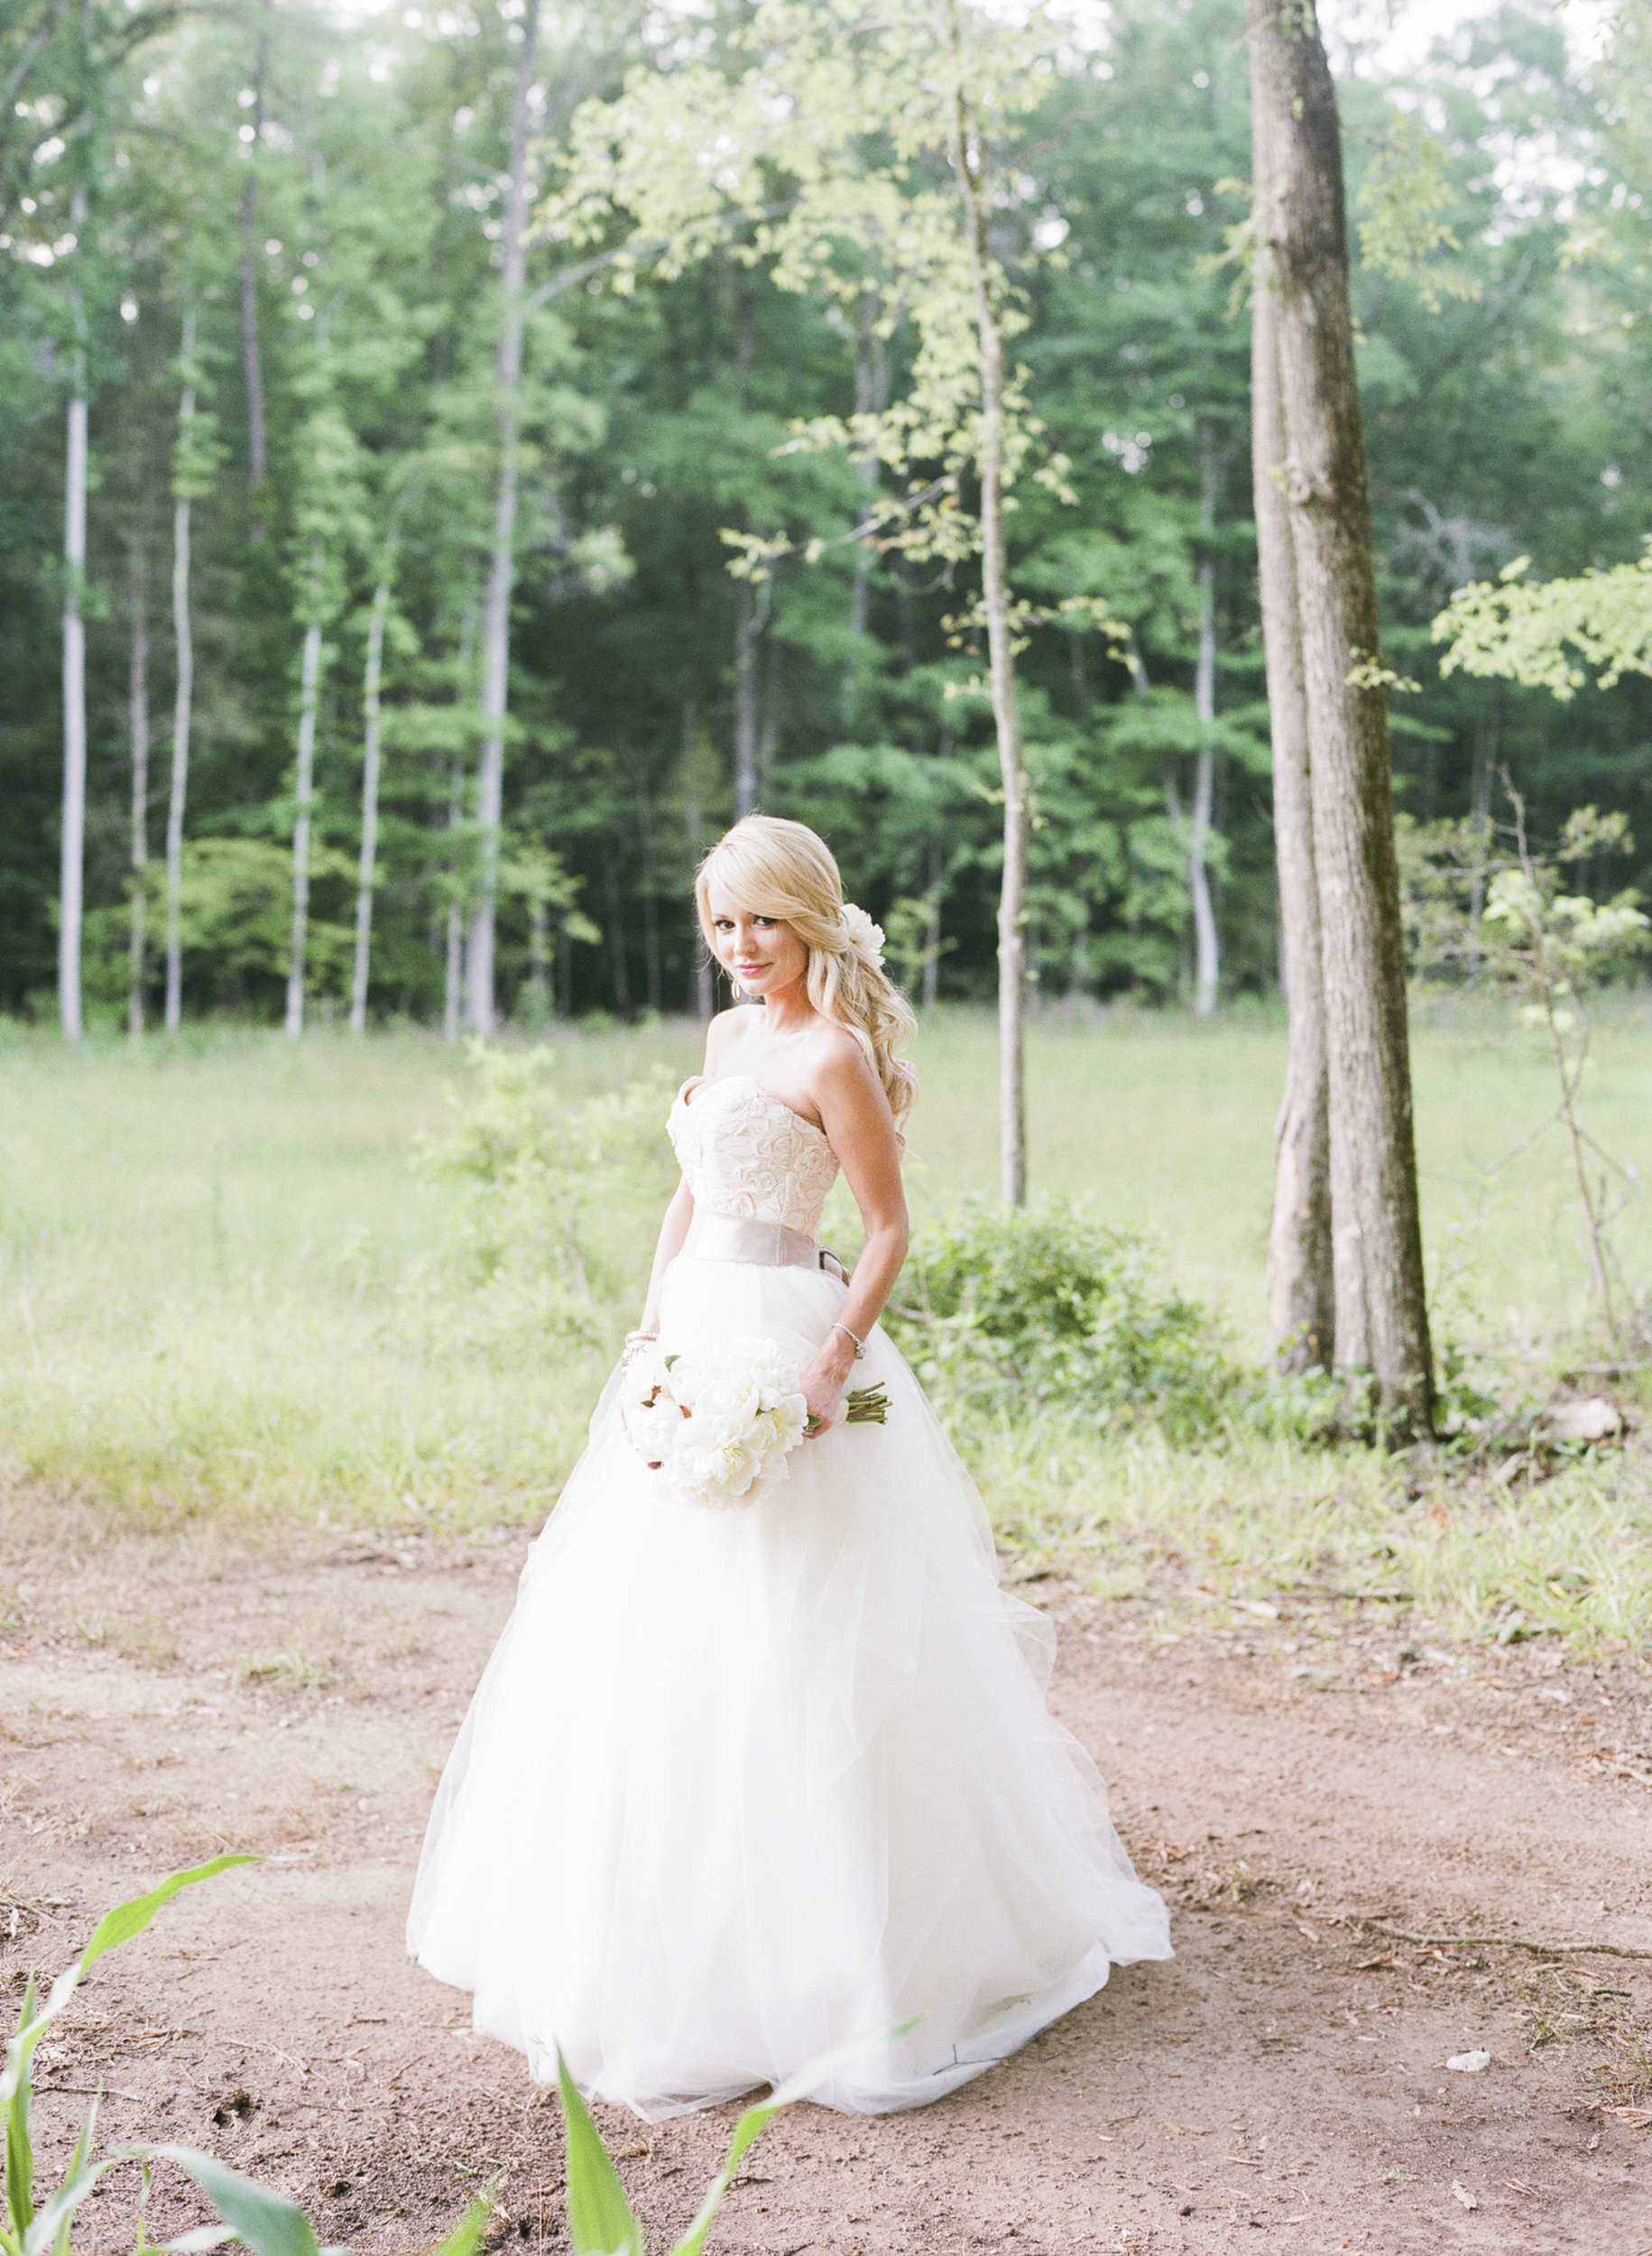 south_carolina_farm_wedding_rustic_chic_surprise_secret_luxe_wedding_bachelorette_emily_maynard_real_weddings-1.jpg